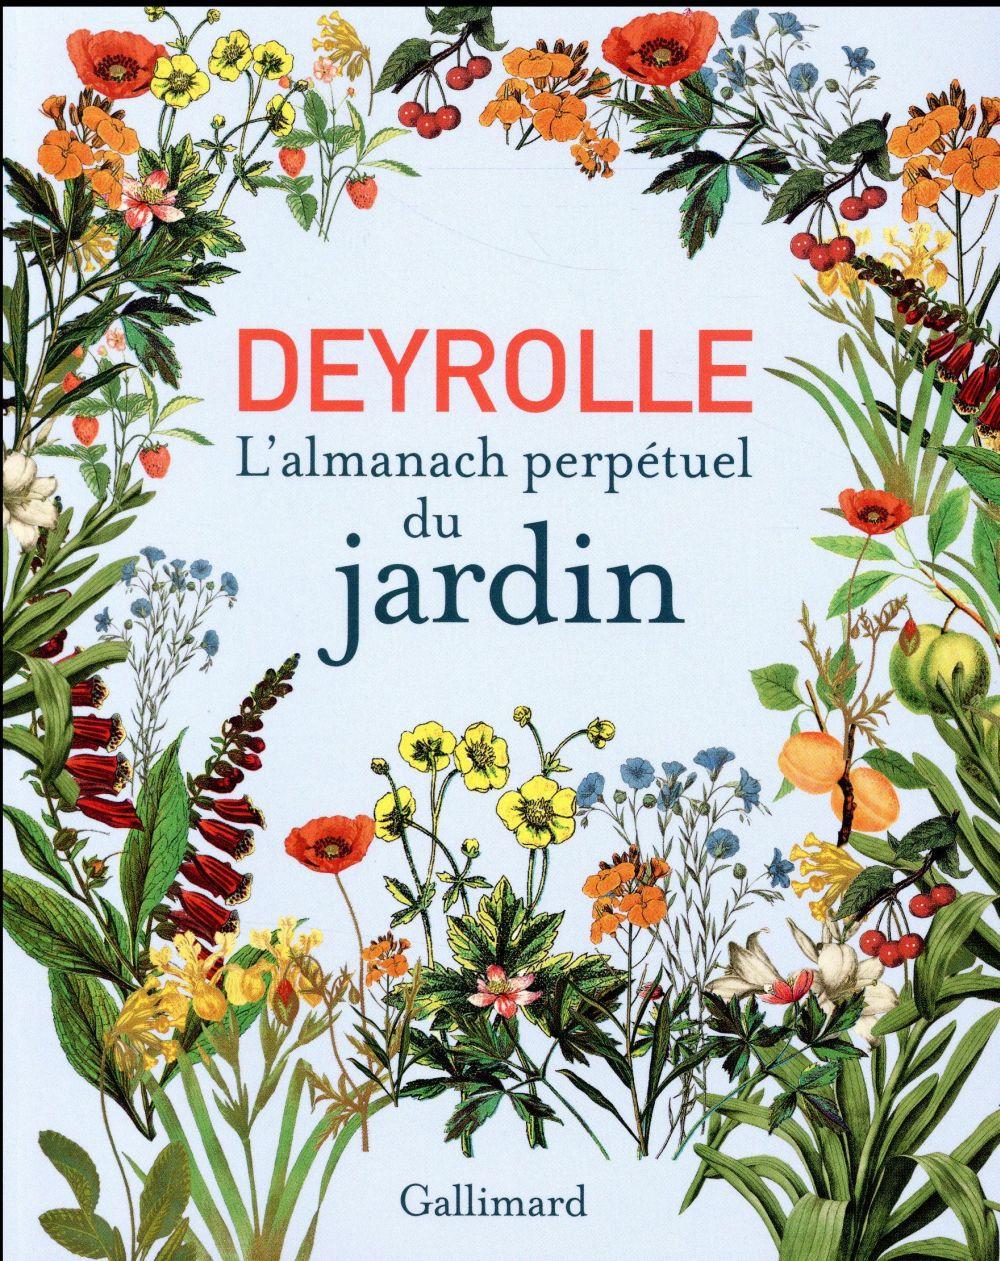 DEYROLLE, L'ALMANACH PERPETUEL DU JARDIN